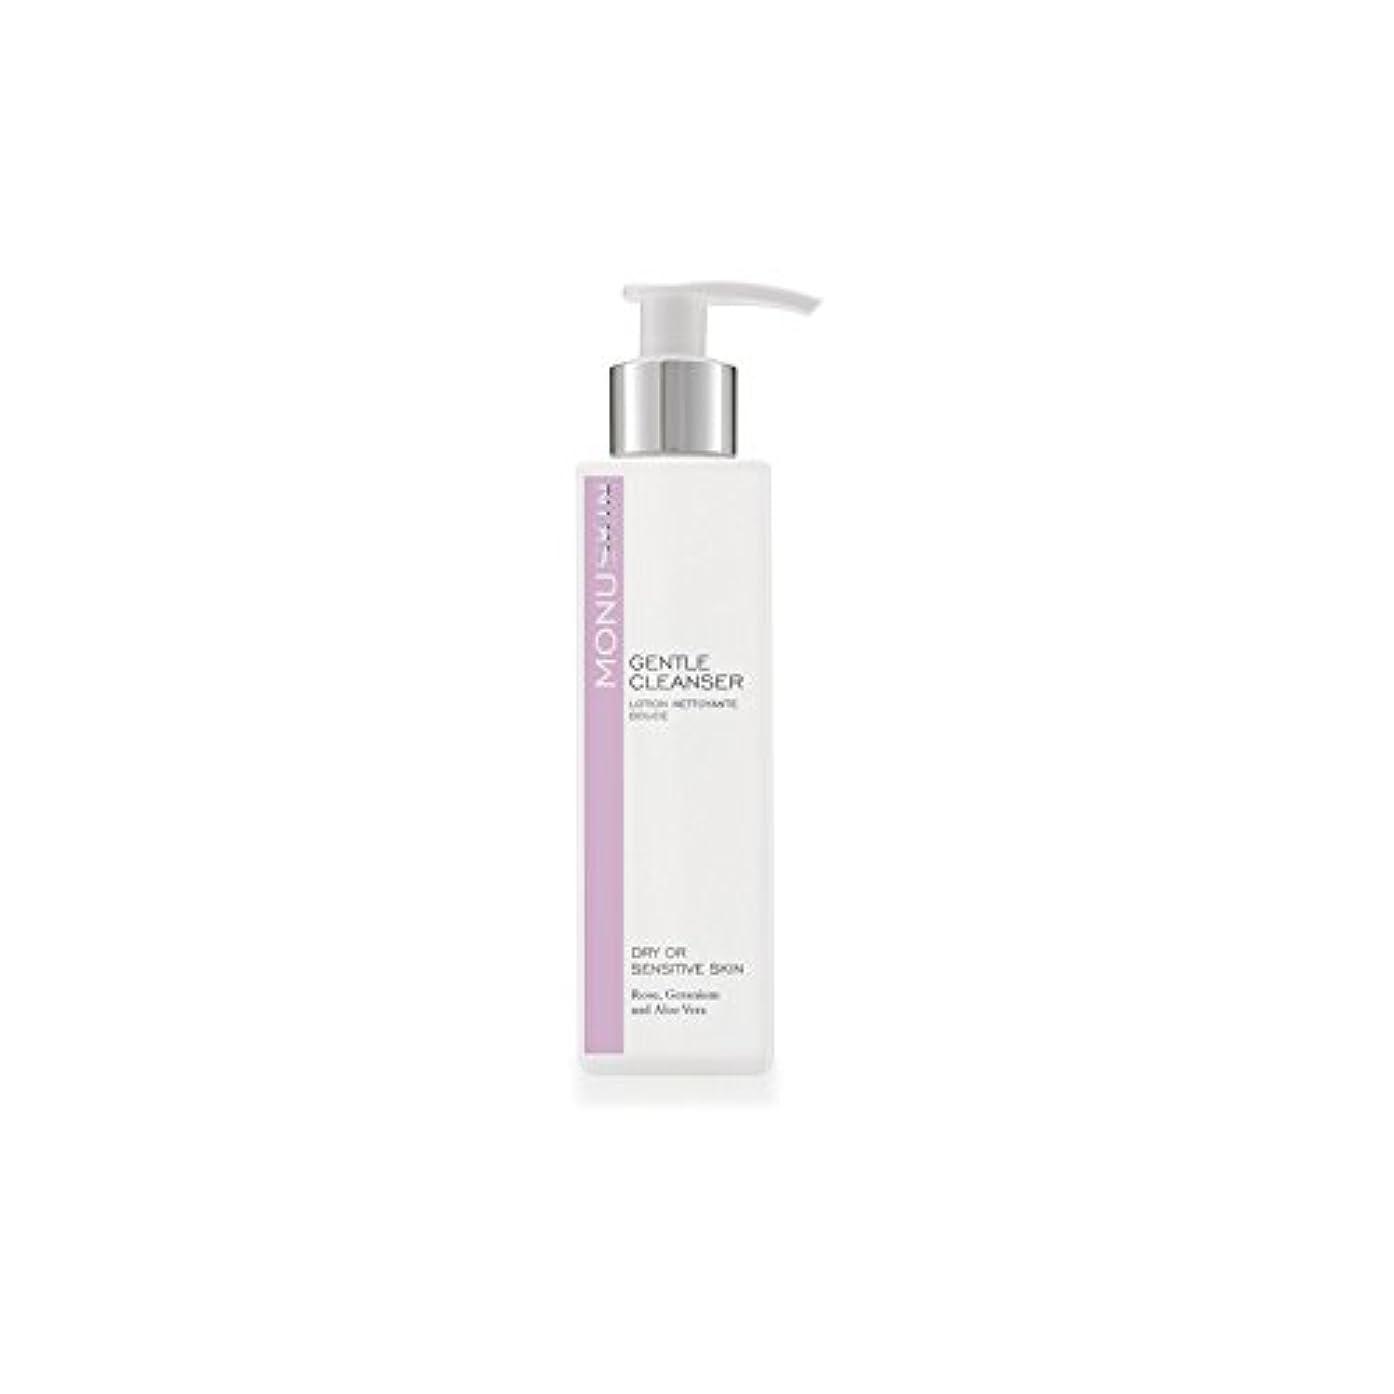 Monu Gentle Cleanser (180ml) - ジェントルクレンザー(180ミリリットル) [並行輸入品]